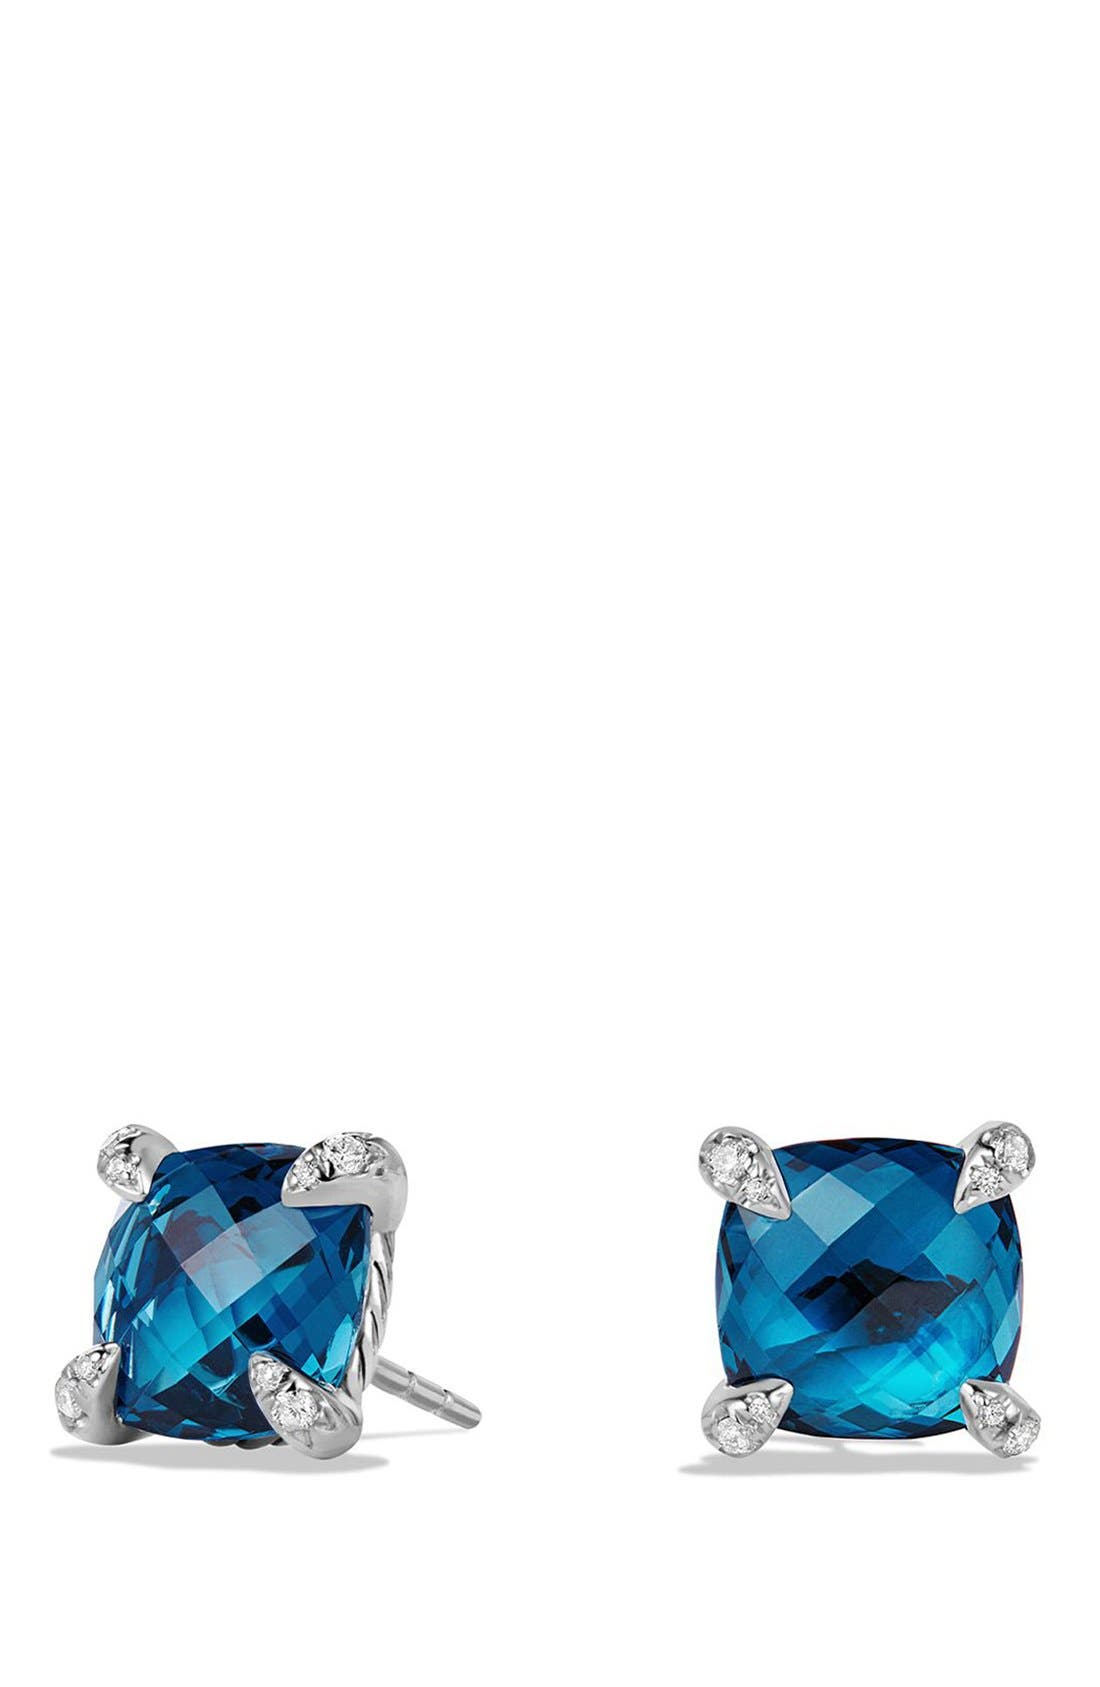 DAVID YURMAN, 'Châtelaine' Earrings with Semiprecious Stones and Diamonds, Main thumbnail 1, color, SILVER/ HAMPTON BLUE TOPAZ